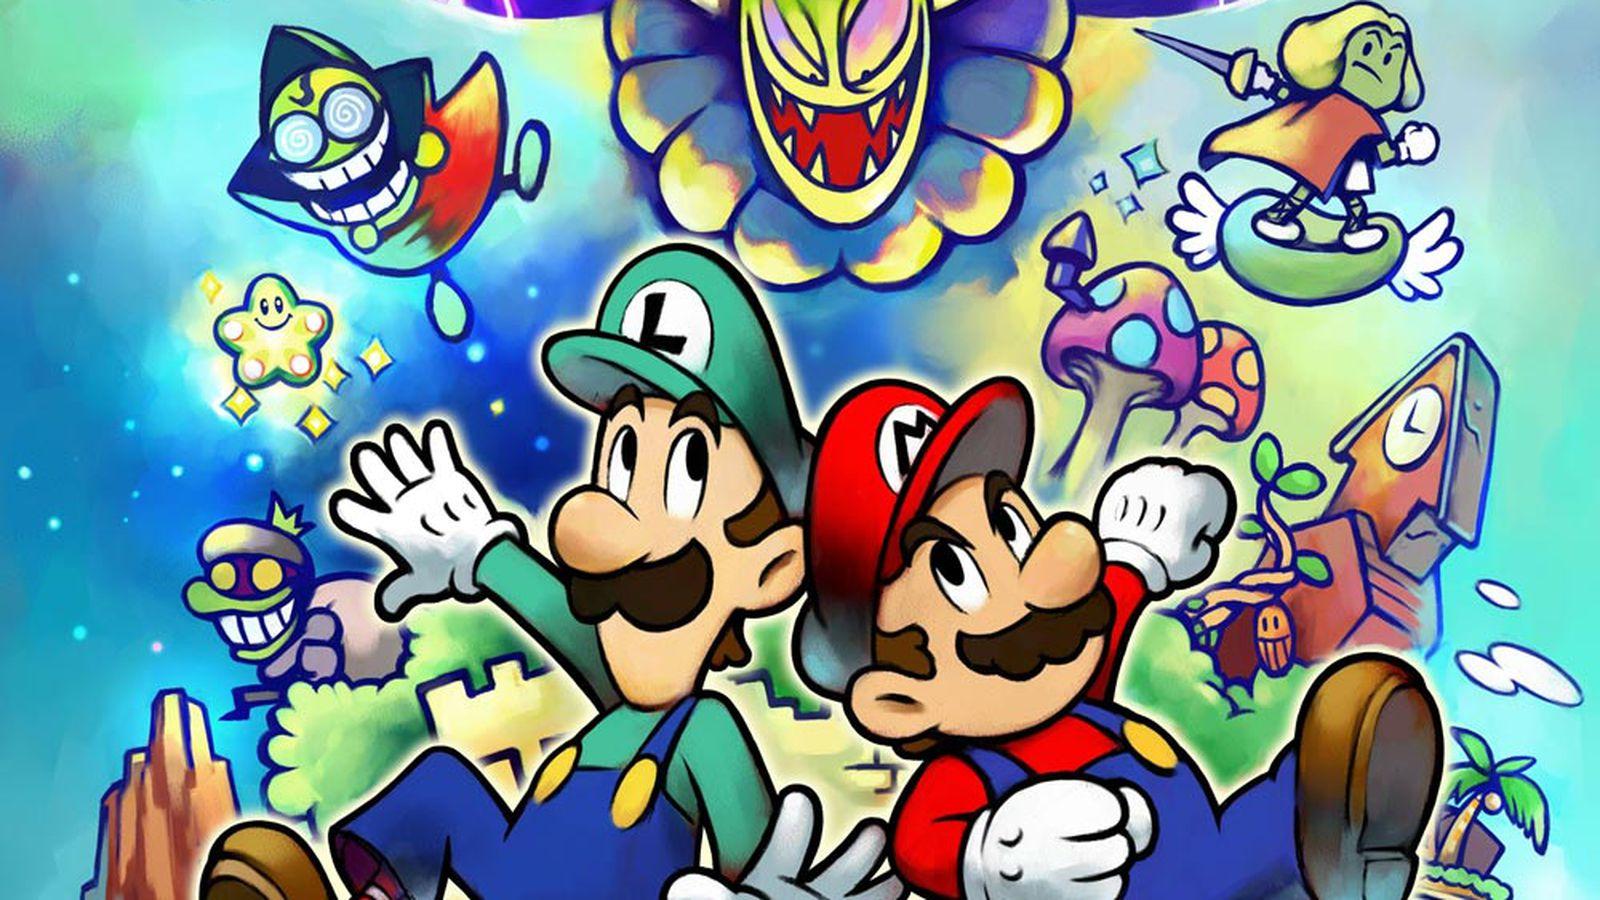 Mario And Luigi Superstar Saga Data Found On Nintendo 3ds